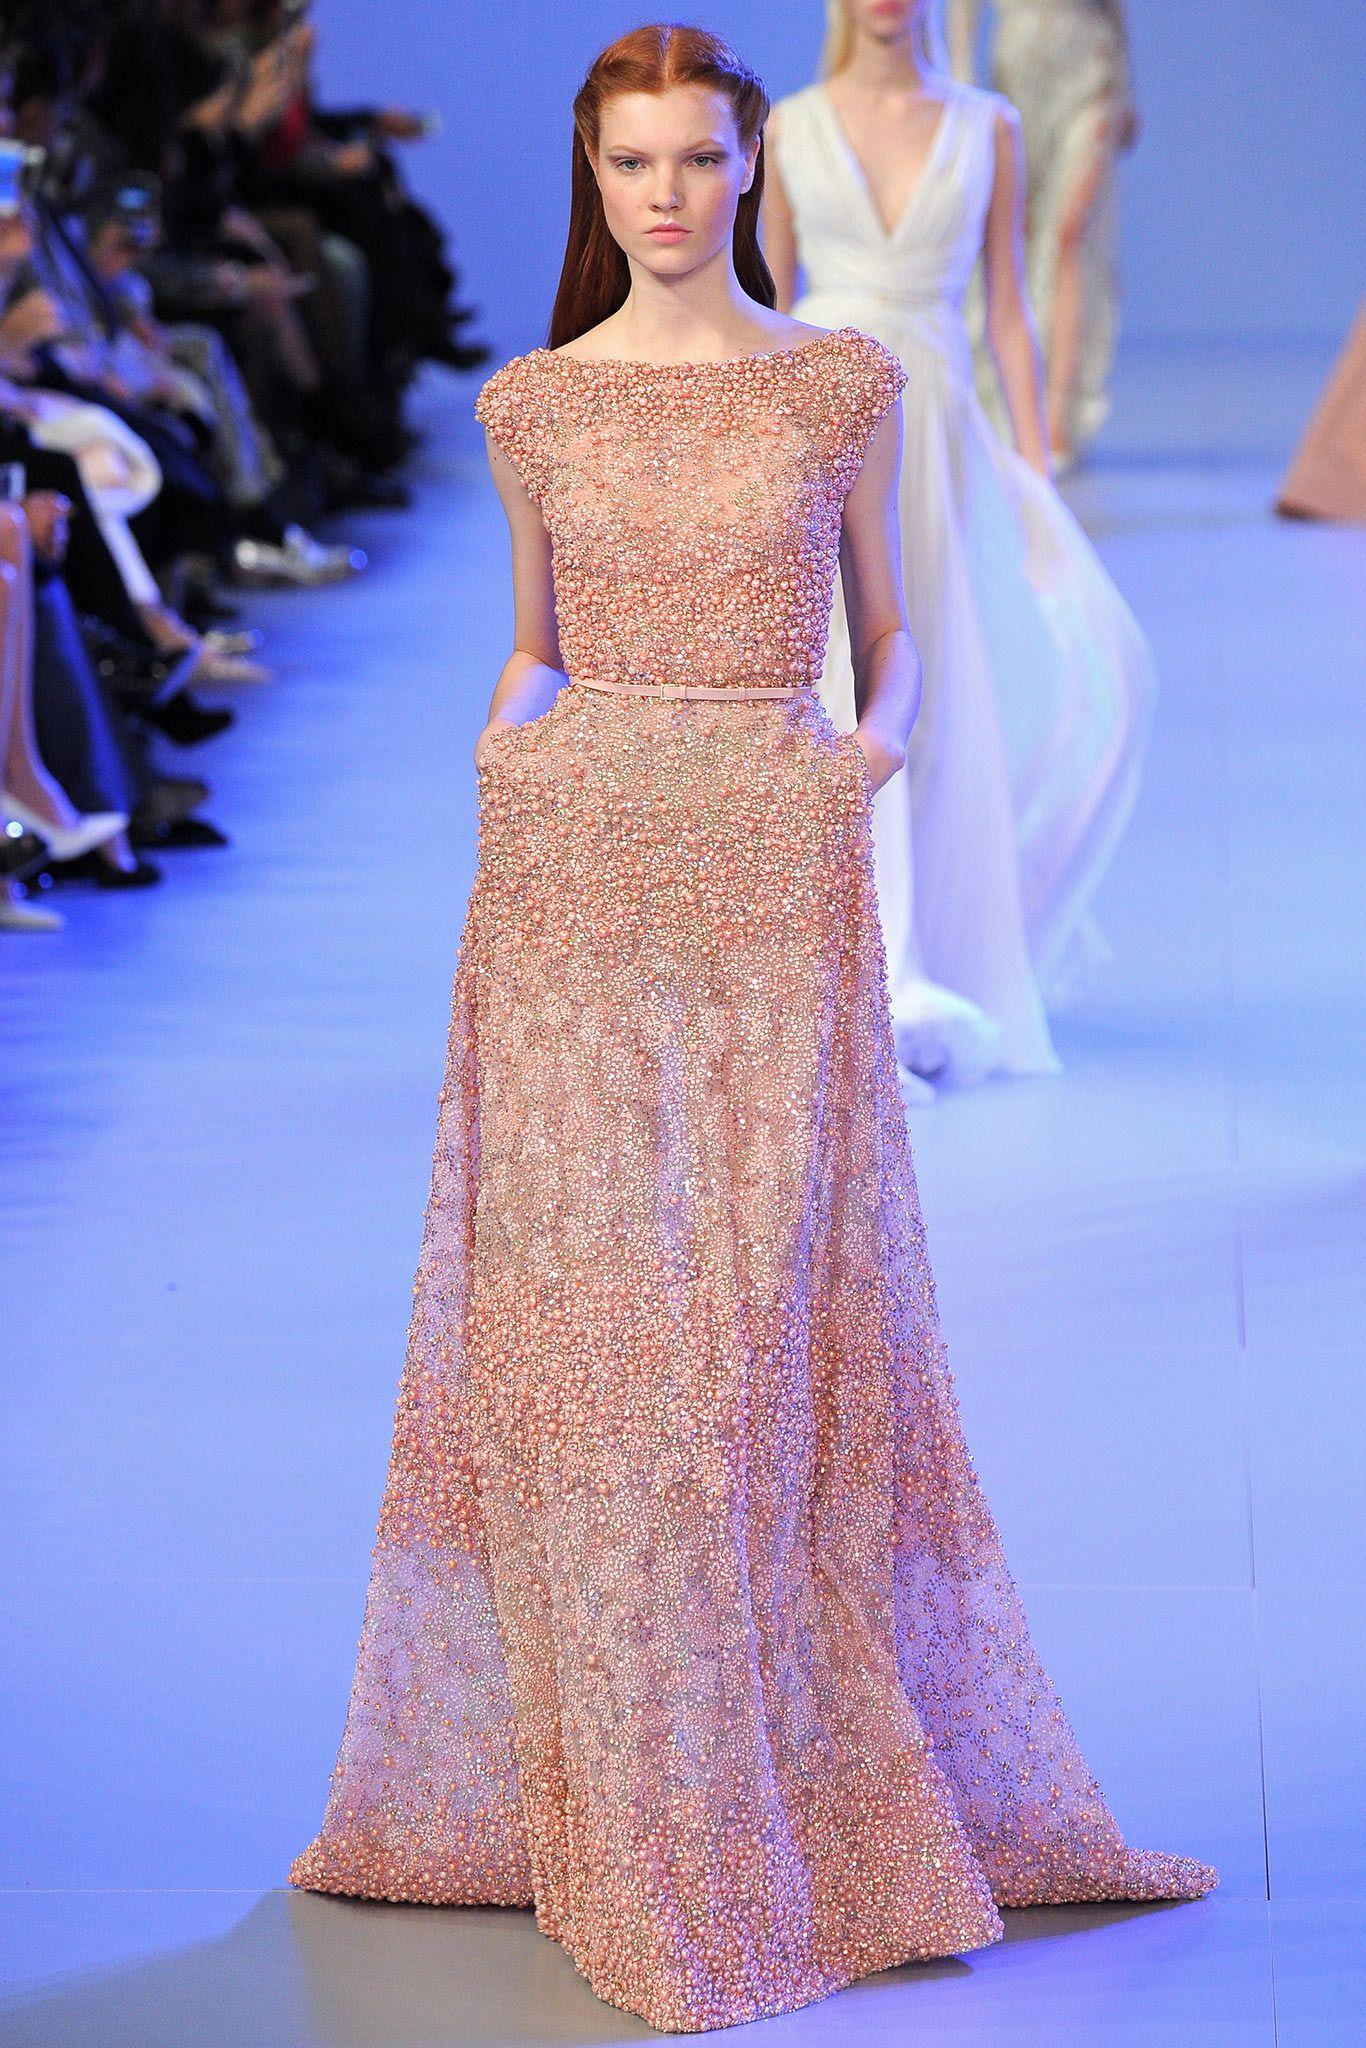 Spring 2014 Couture - Elie Saab | Dress me up | Pinterest | Vestiditos